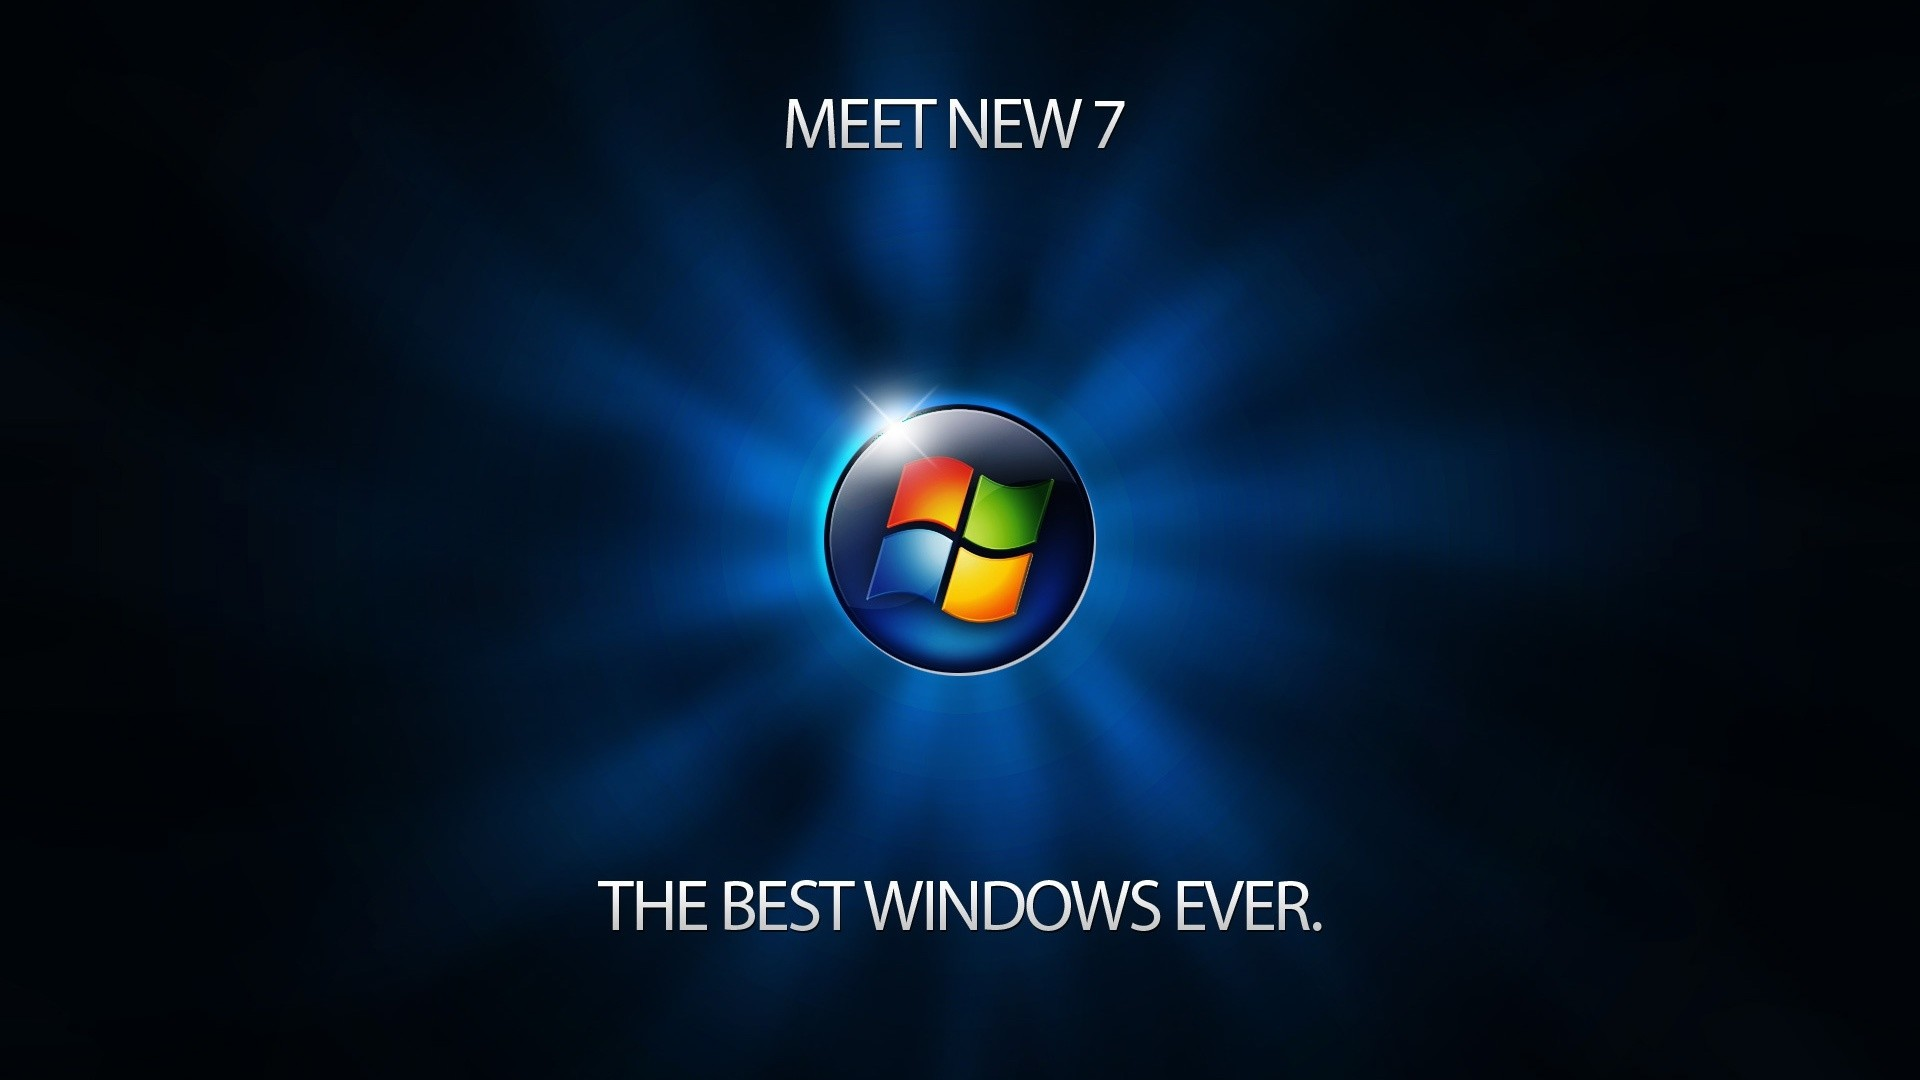 1920x1080 Download WindowsBlue HD Wallpaper